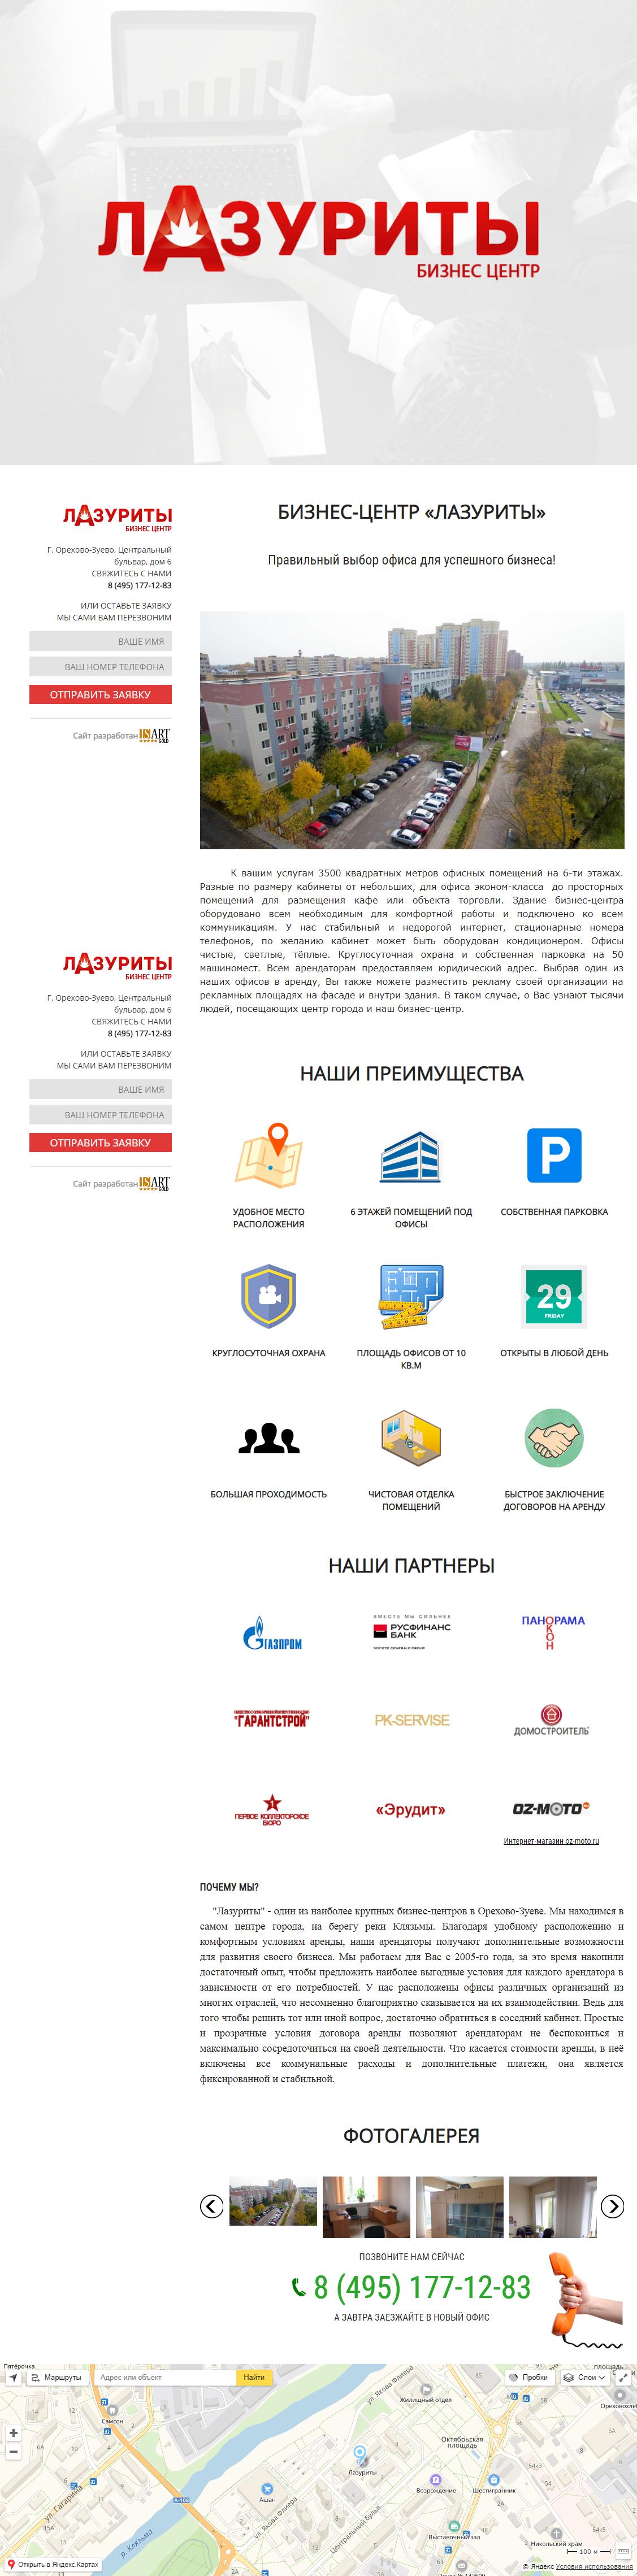 Макет сайта Разработка сайта для бизнес центра 1